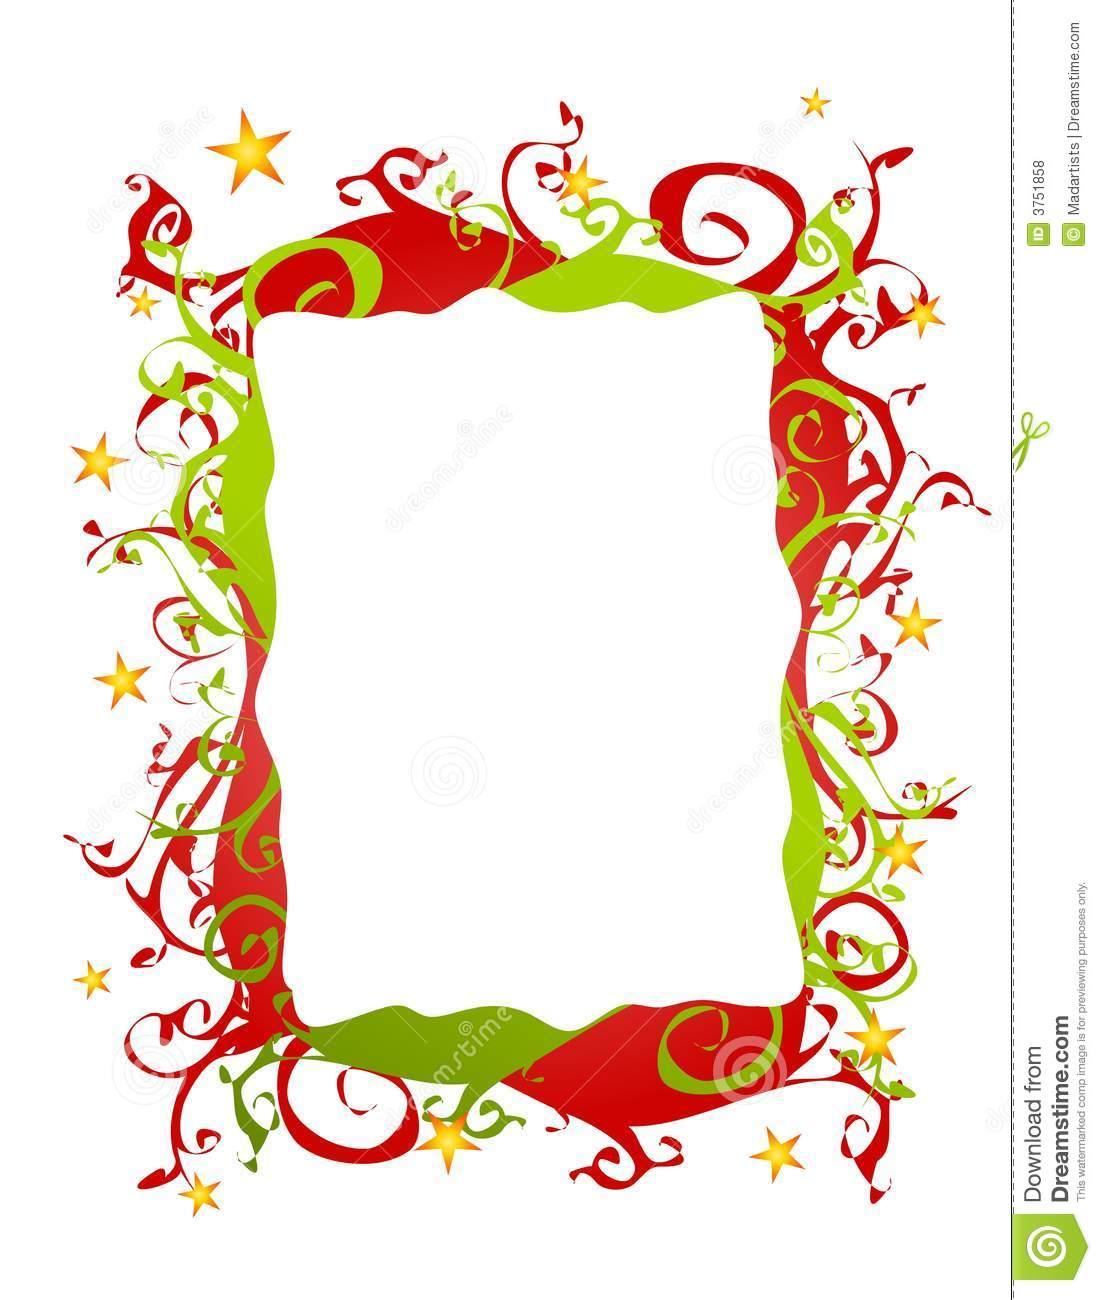 Christmas Borders Clip Art .-christmas borders clip art .-2